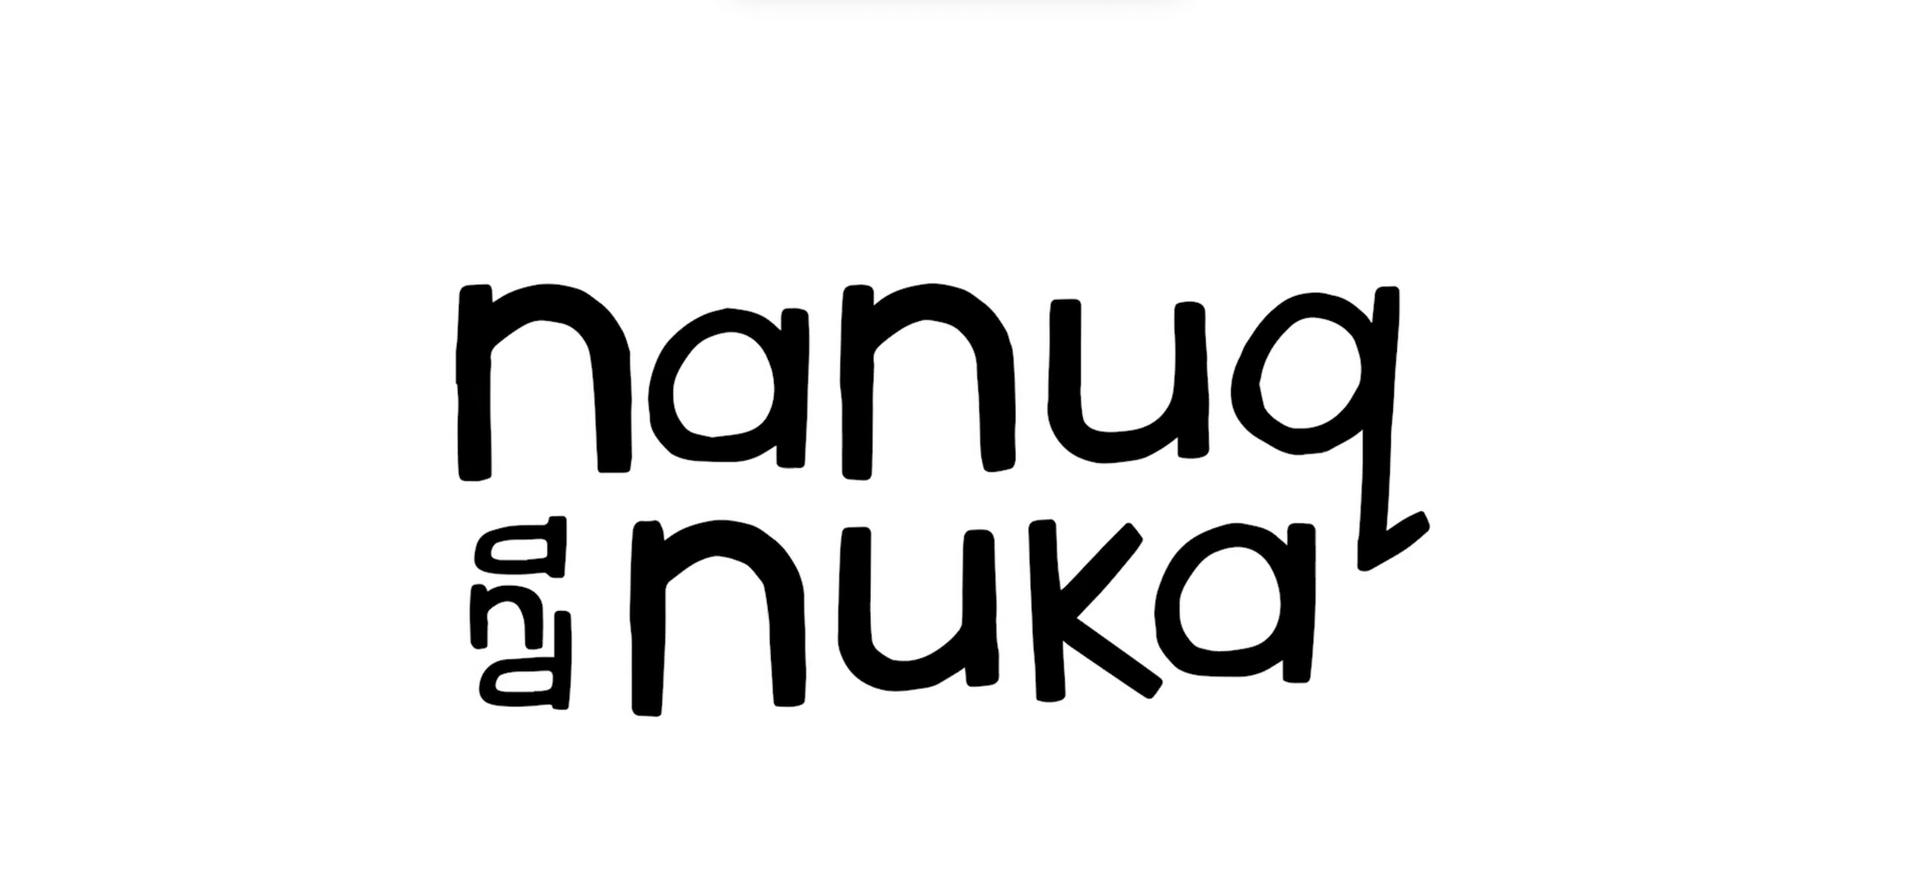 Nanuq and Nuka (digital series)